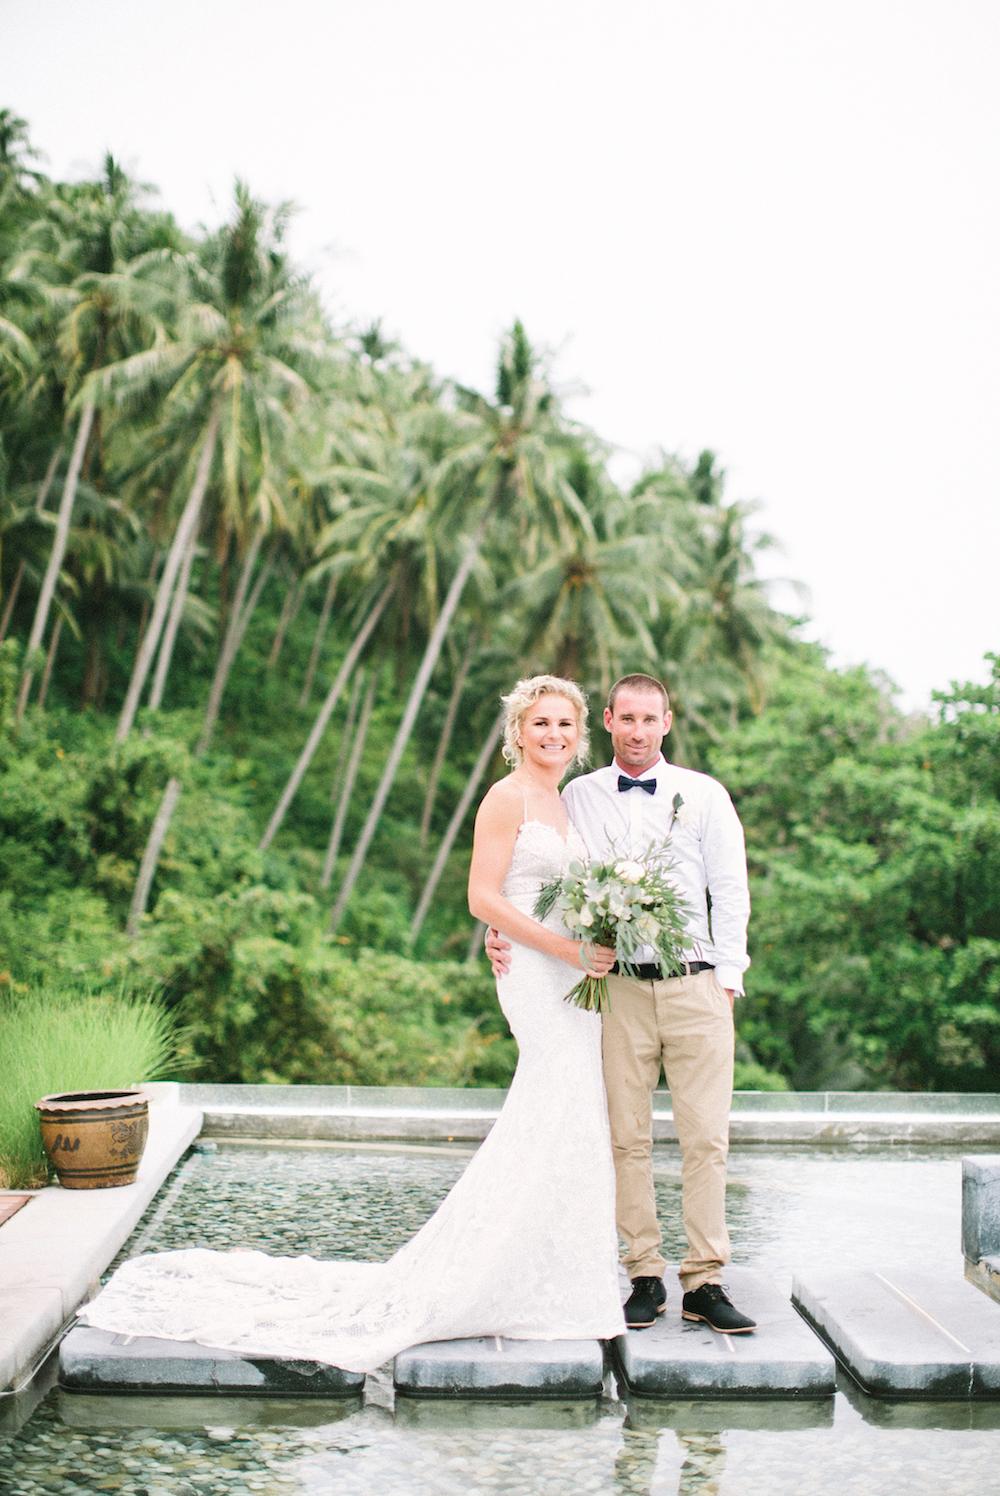 ©-saya-photography-studio-ohlala-wedding-photographer-photographe-mariage-the-naiharn-phuket-147.jpg